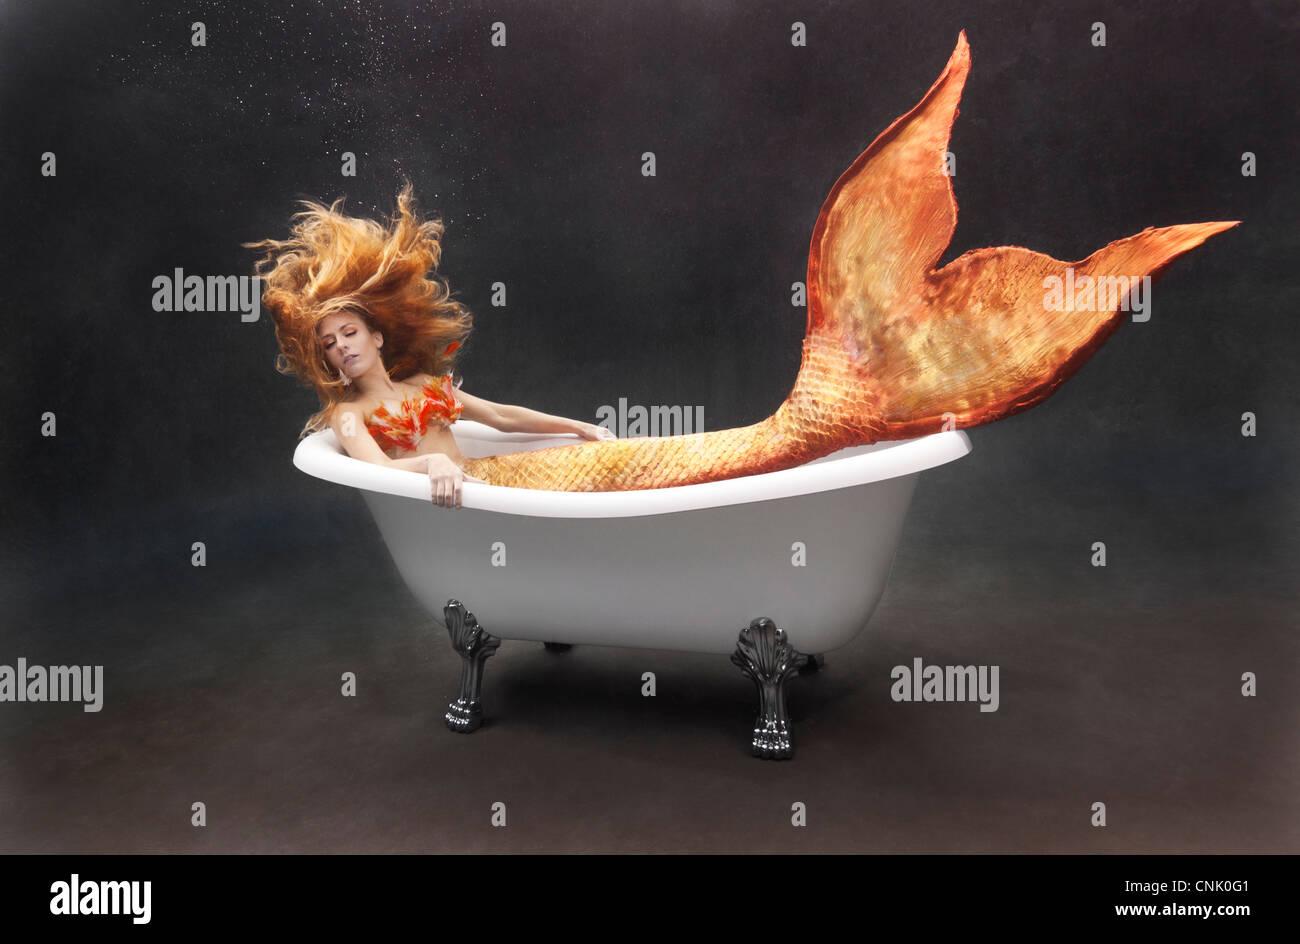 Young mermaid lounging underwater in her Victoria + Albert bathtub - Stock Image